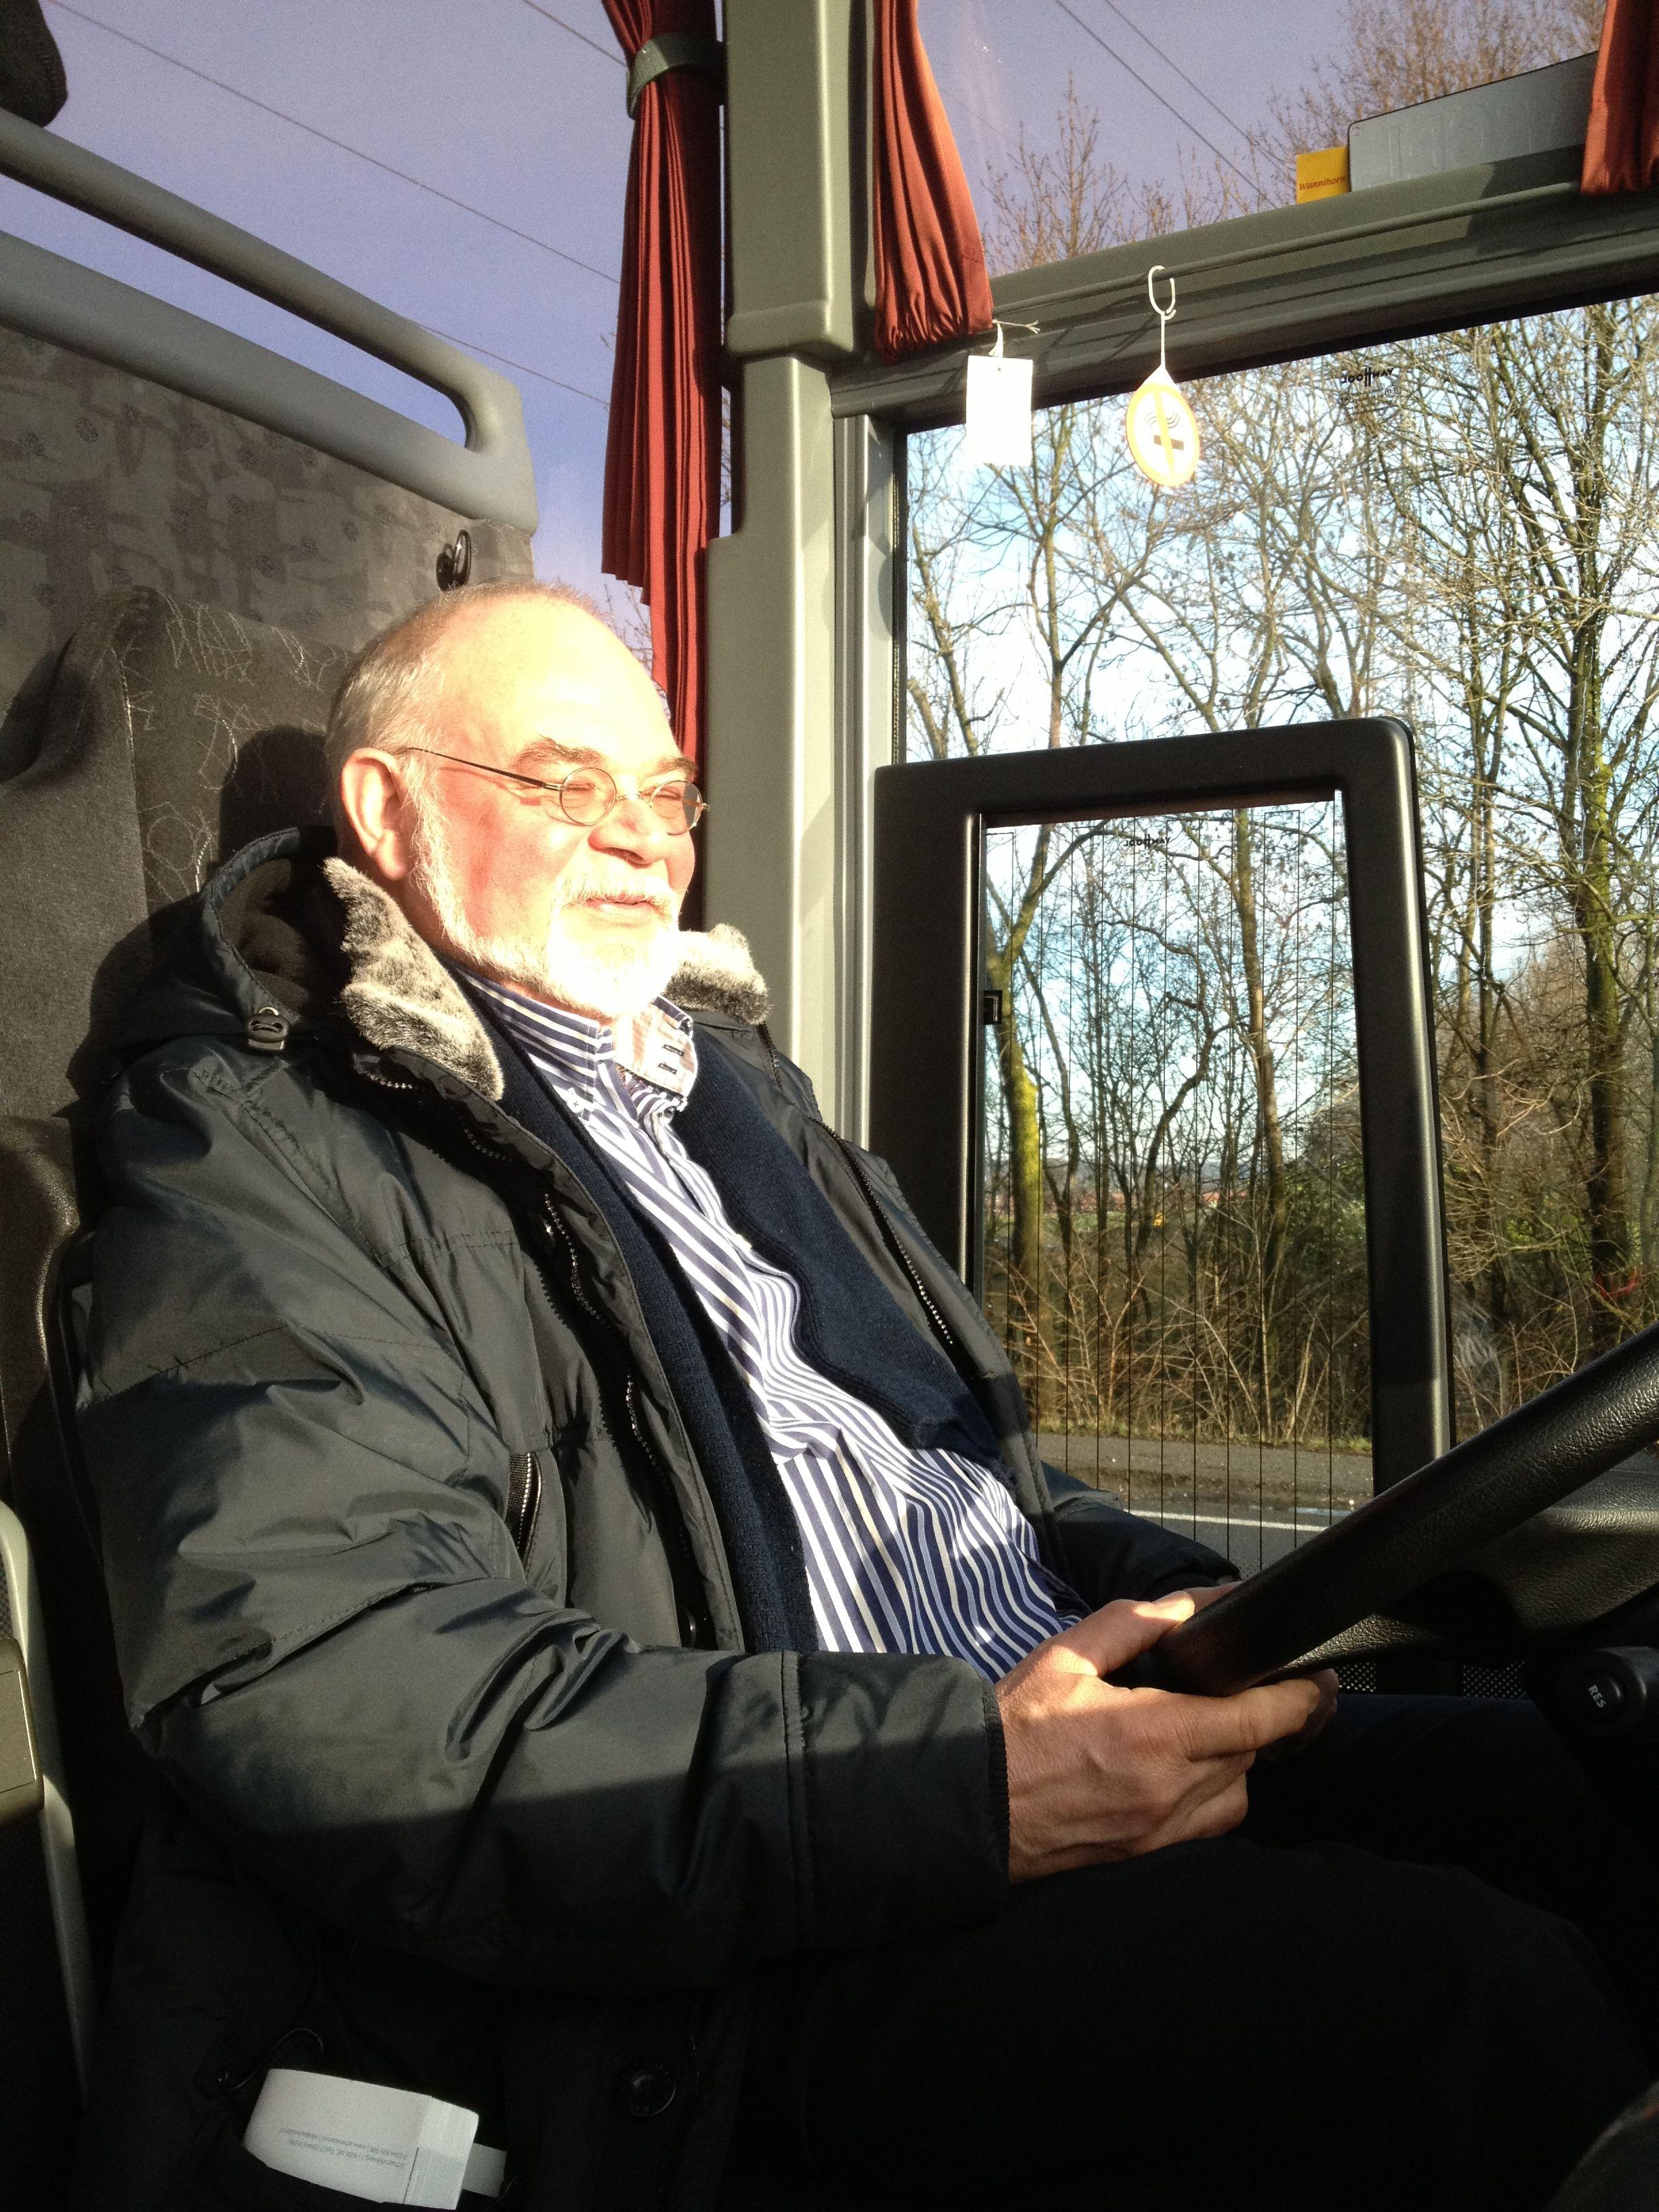 Peter Brouwer Behind The Wheel